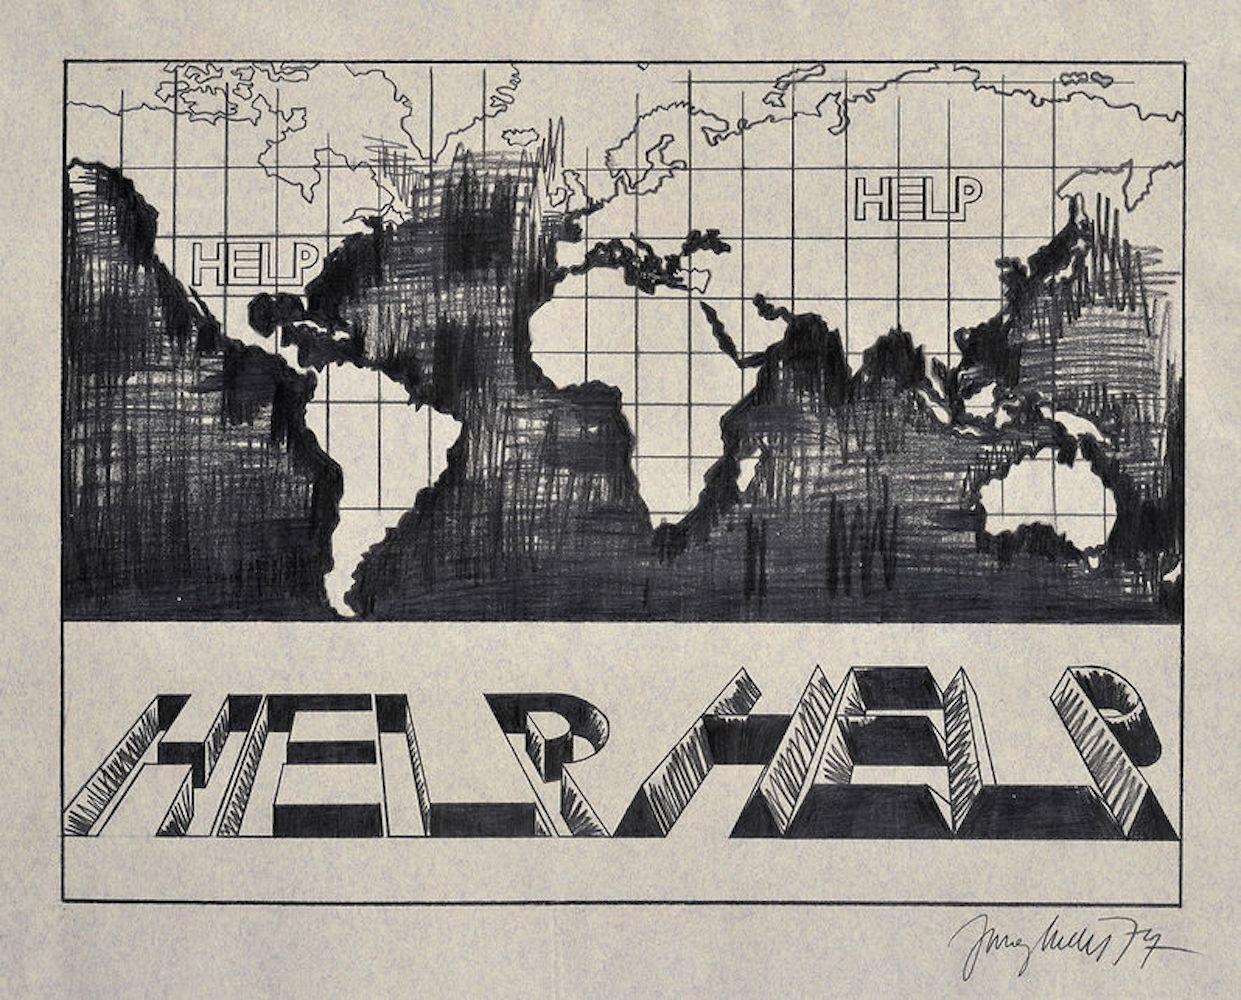 1974, Help, kresba ceruzou na papieri, 51 x 65 cm